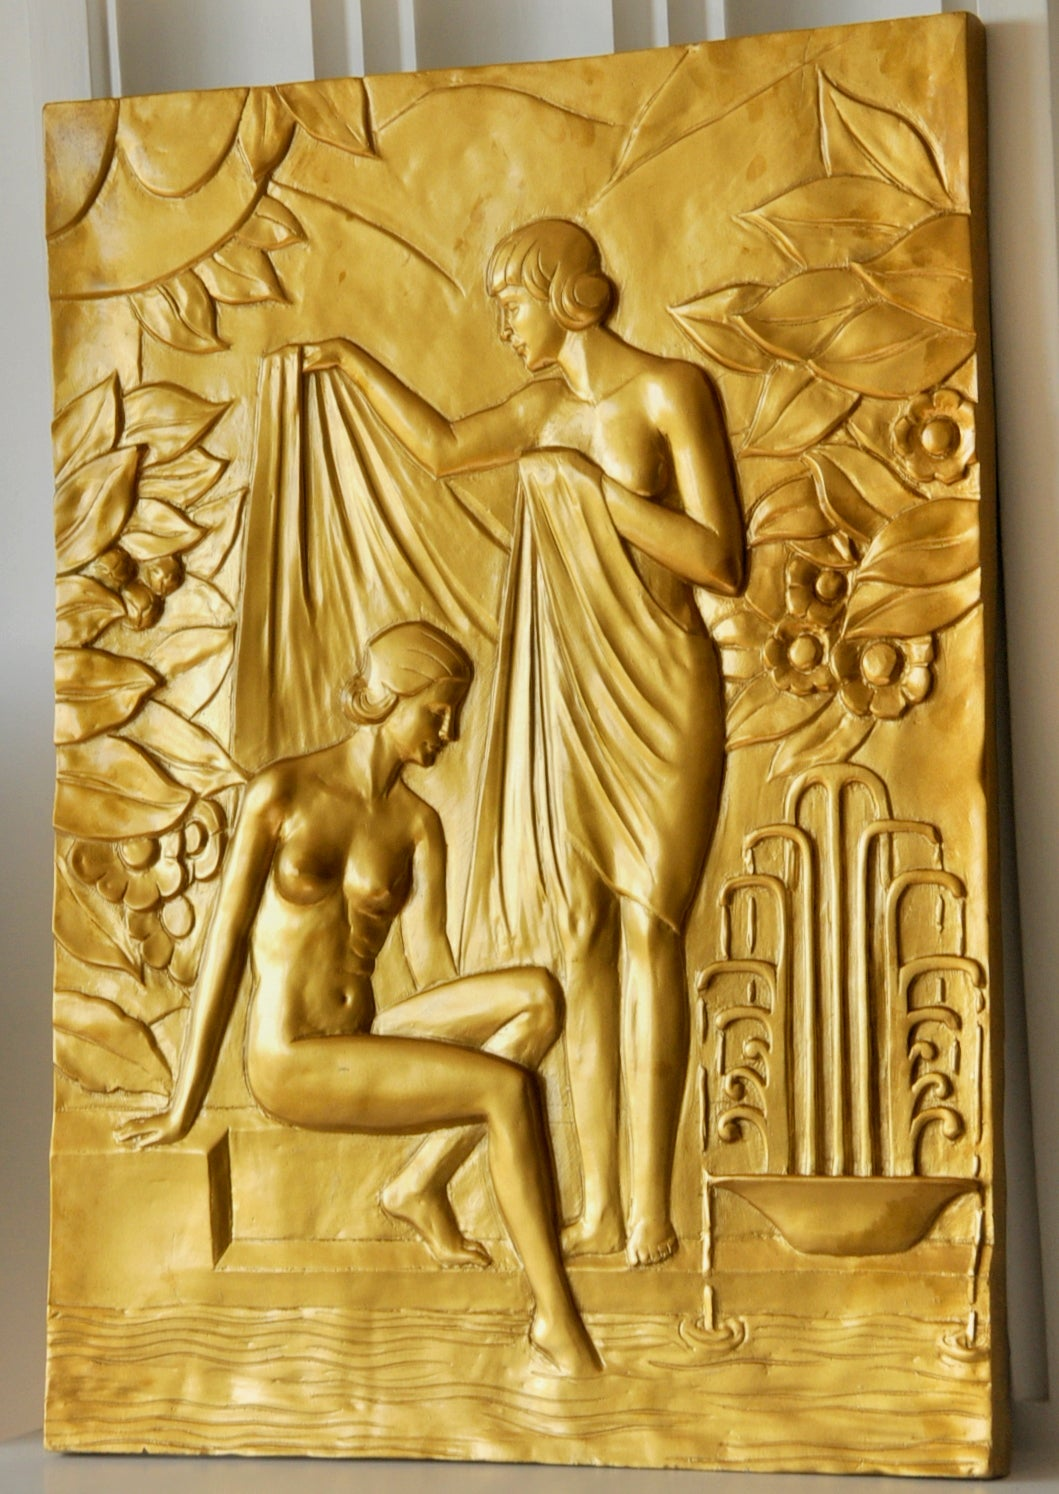 Fine Sculpted Wall Art Model - All About Wallart - adelgazare.info